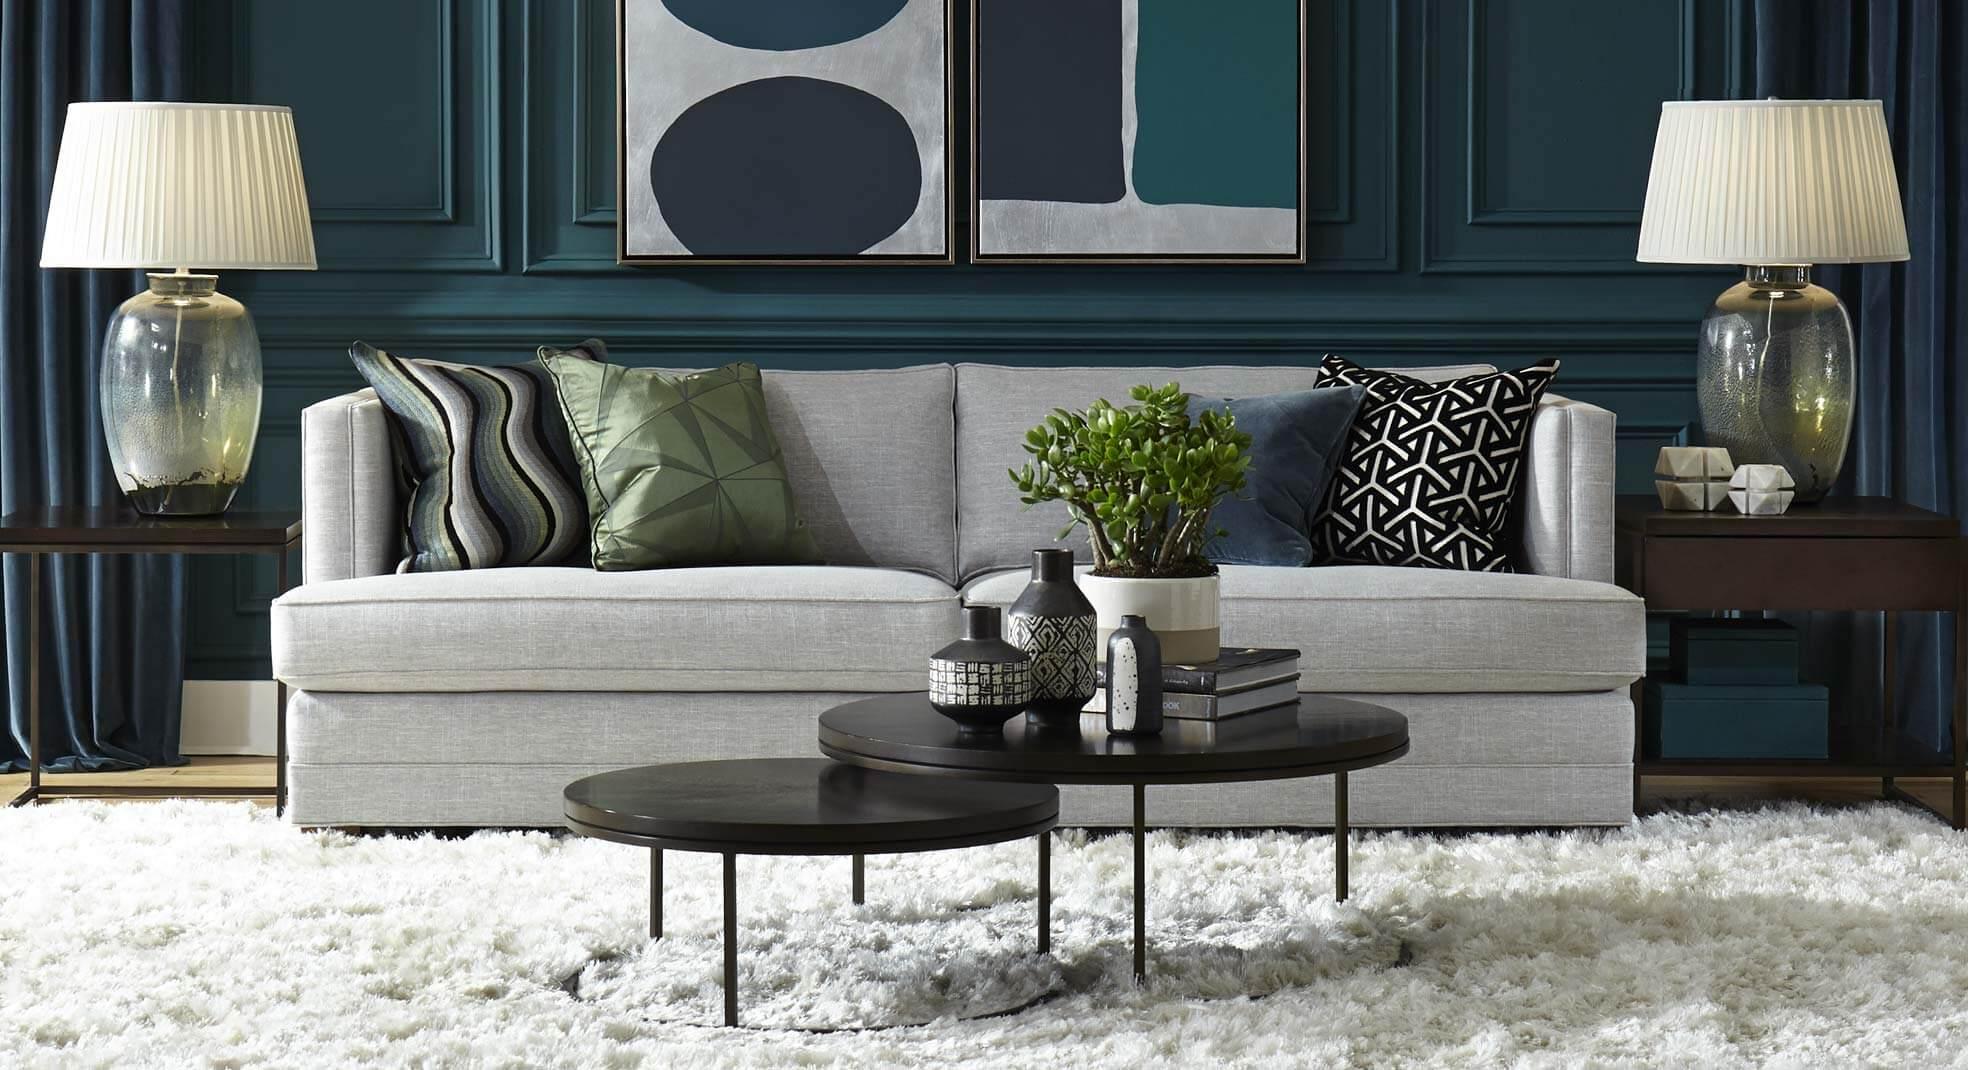 Keaton Sofa - Fall 2019 Living Room Setting